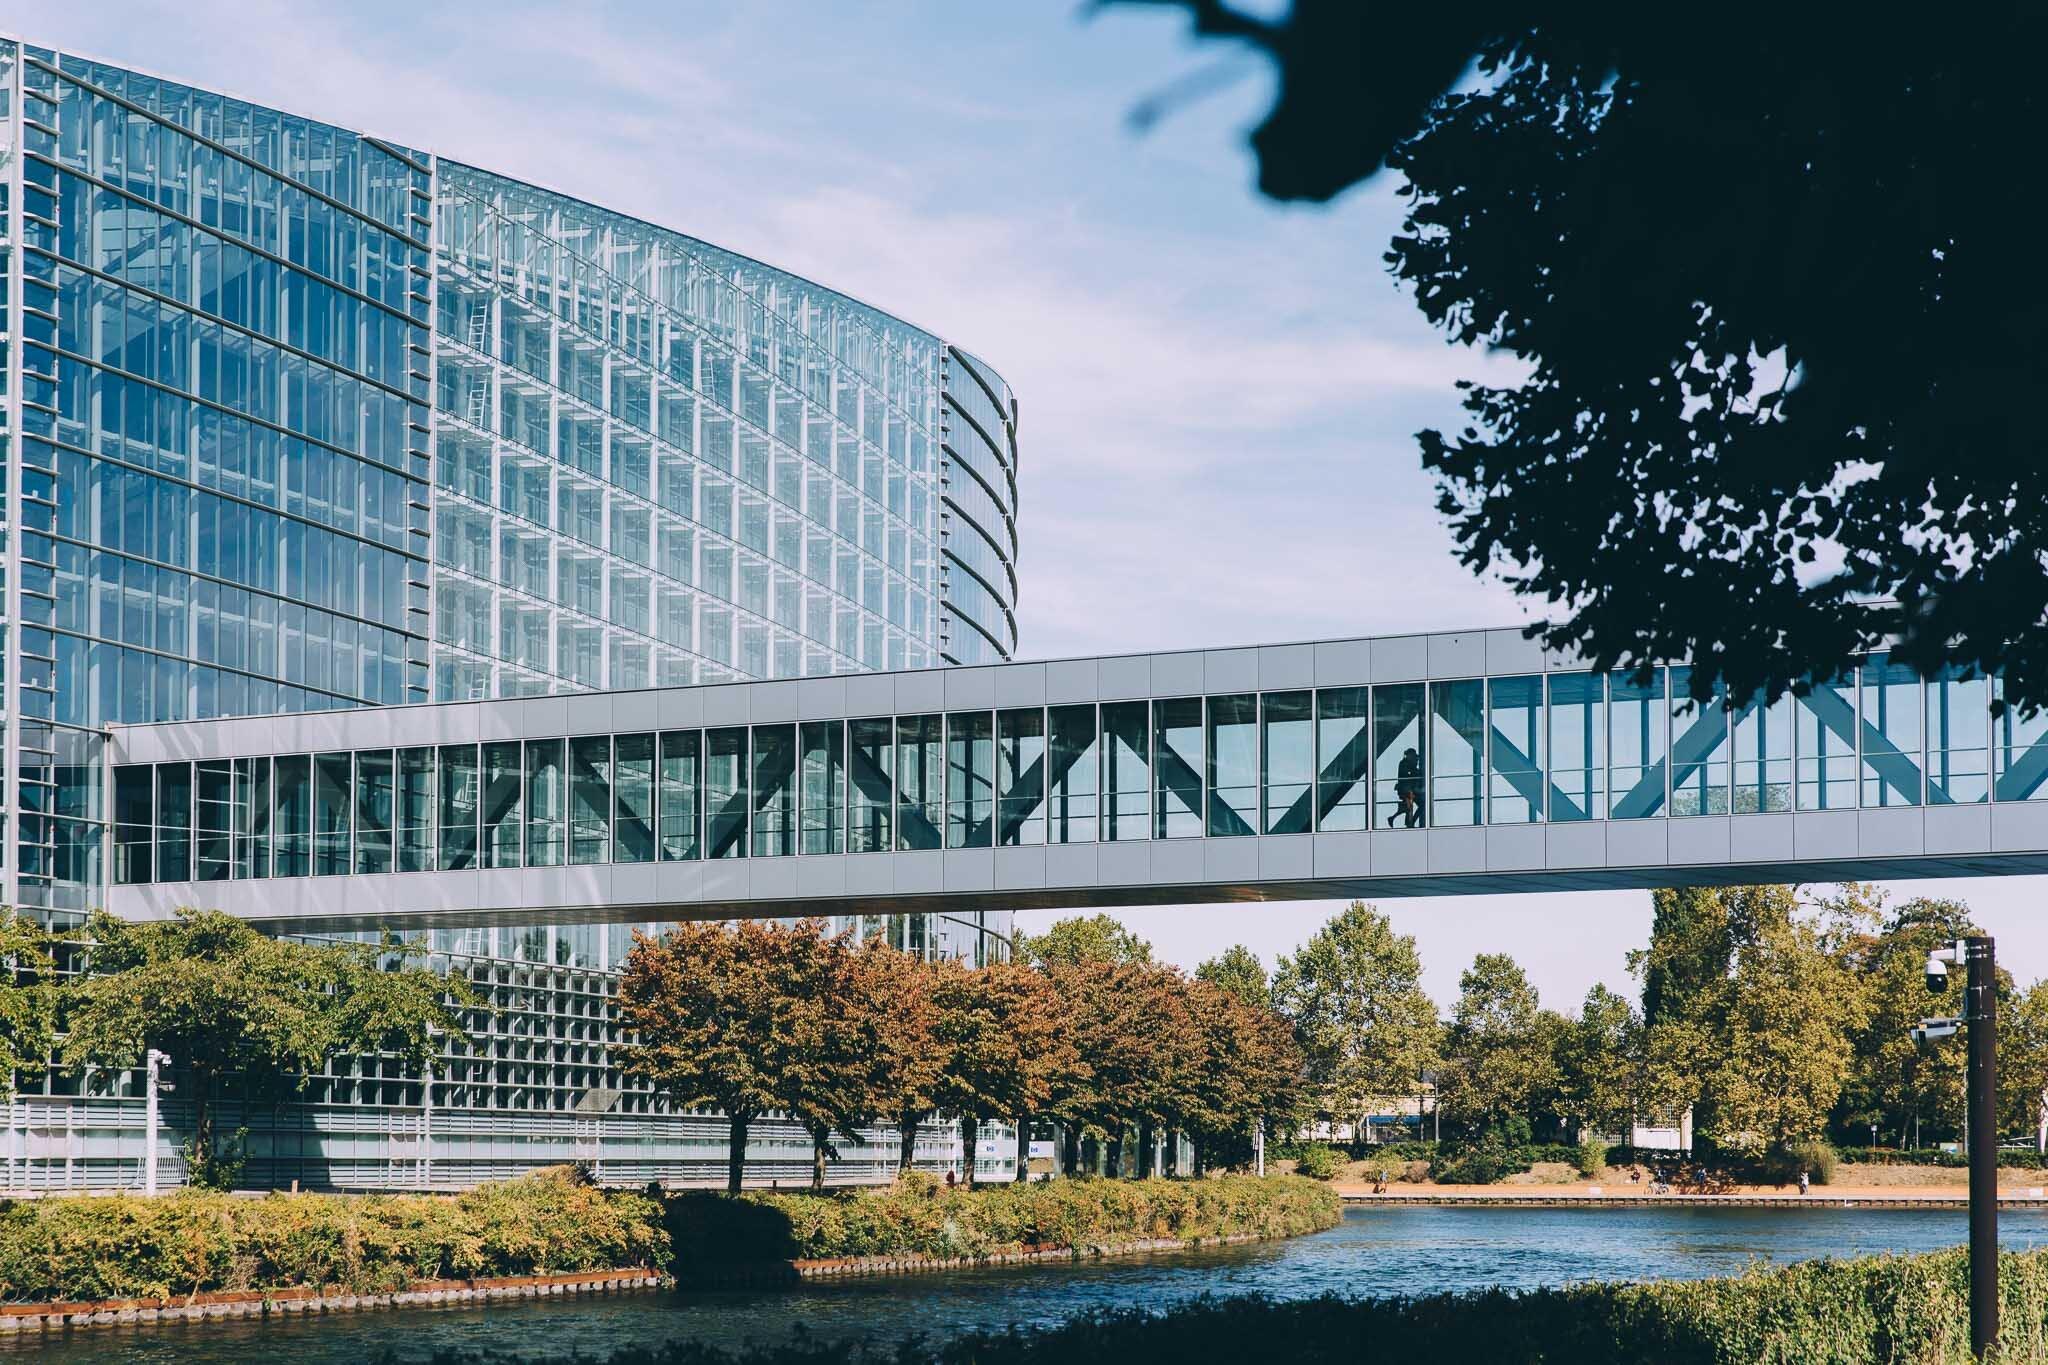 FRANCE - STRASBOURG - EUROPEAN PARLIAMENT